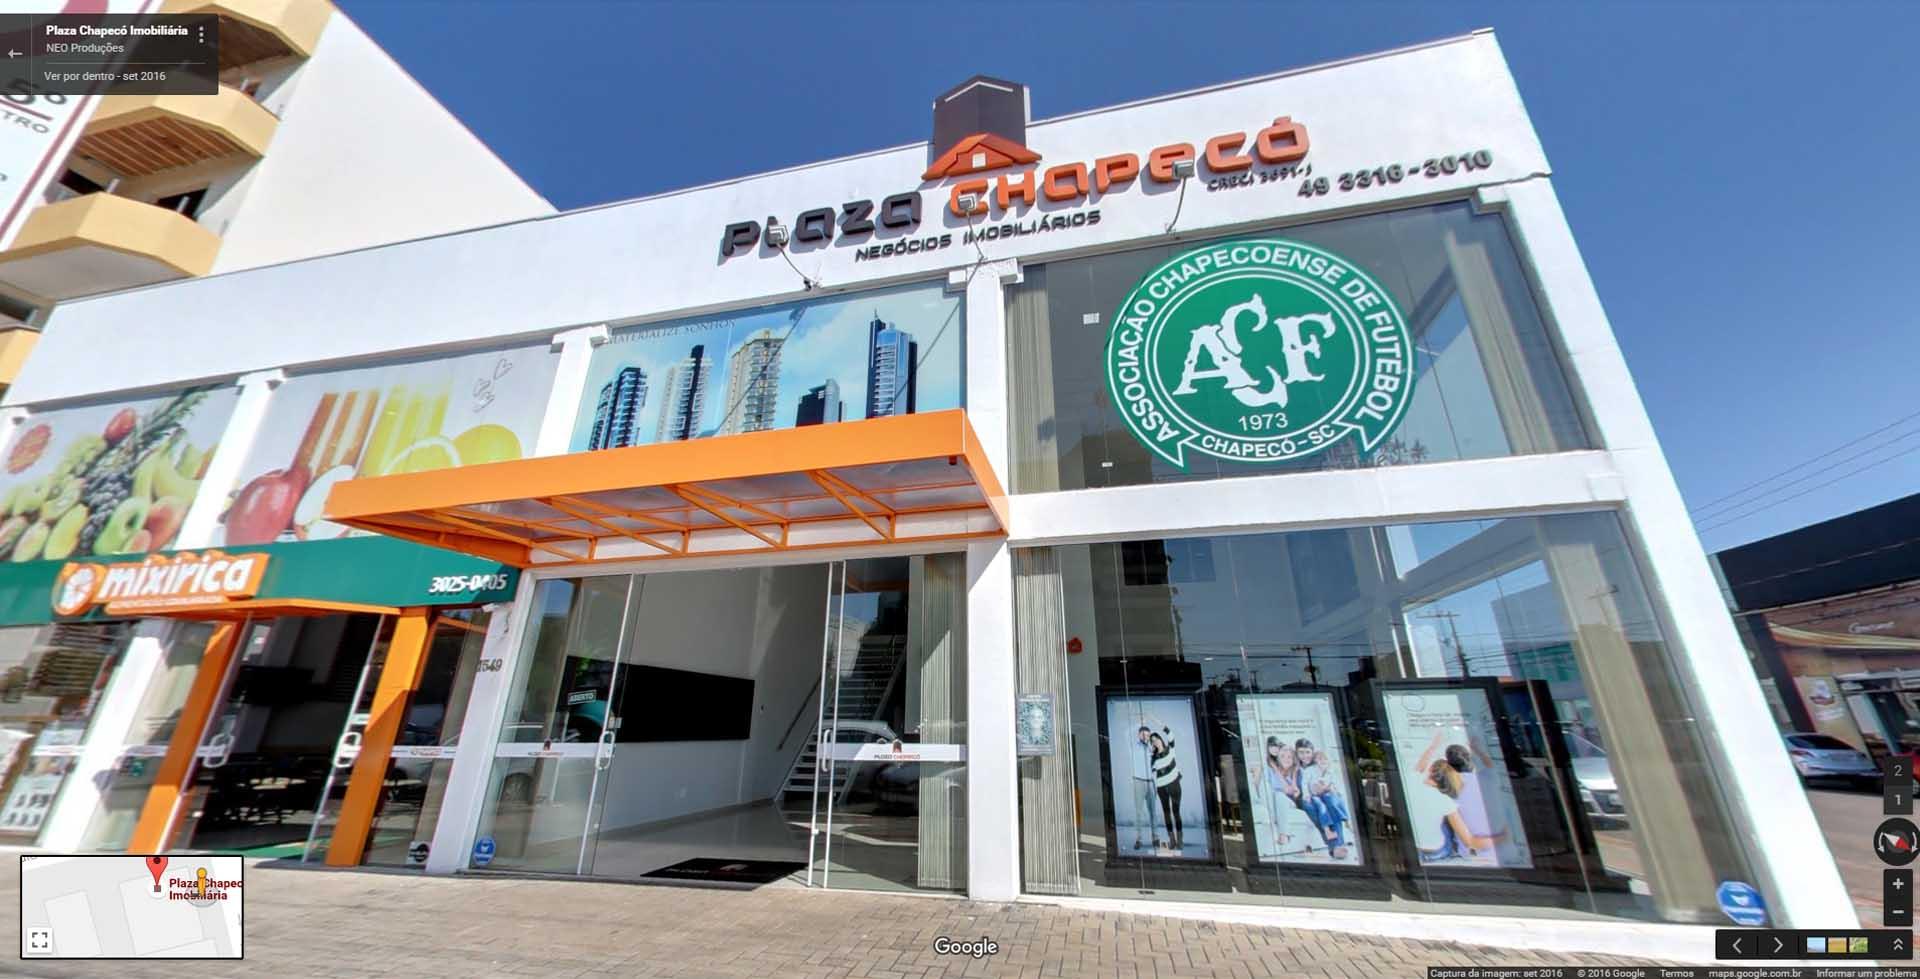 Plaza Chapecó